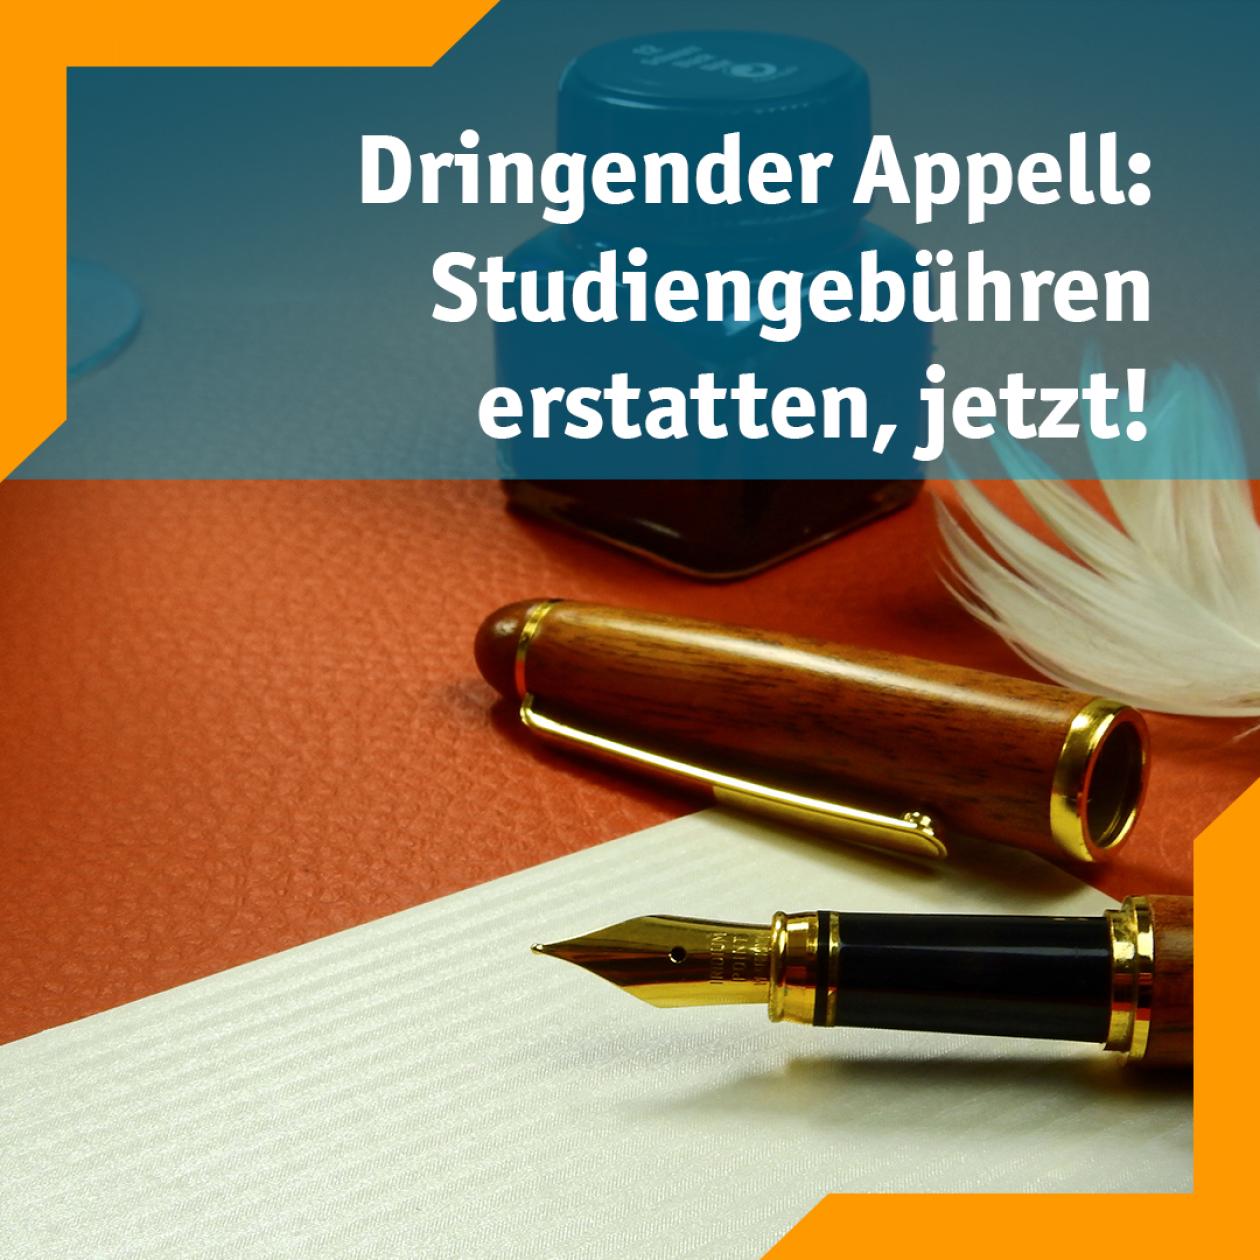 Dringlicher Apell: Studiengebühren erstatten, jetzt!